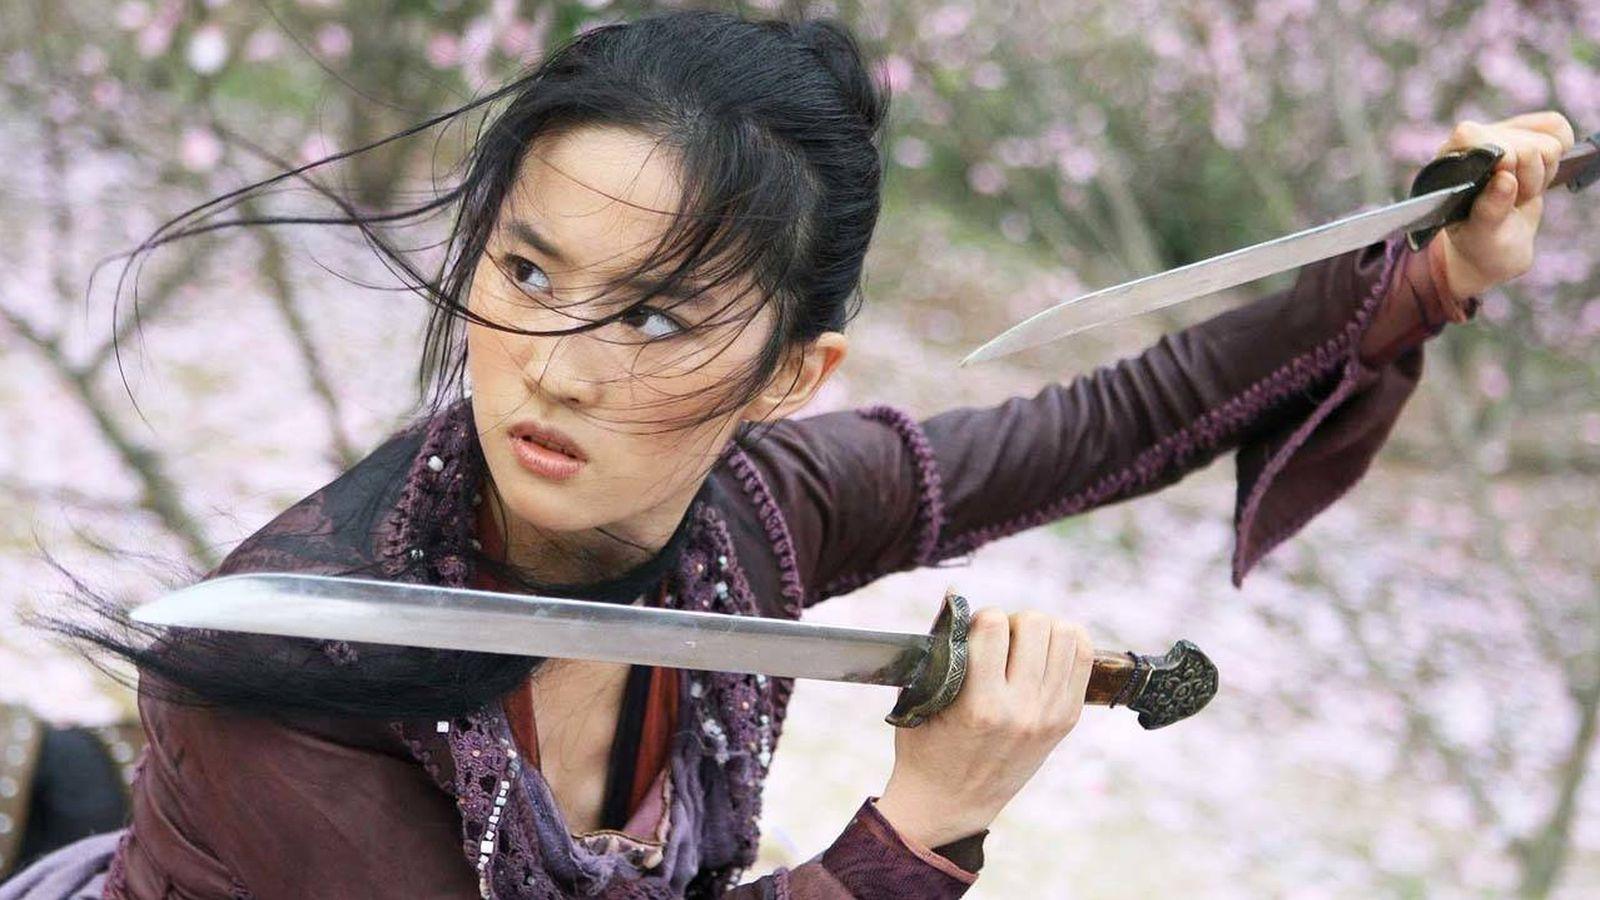 Foto: Imagen de la actriz Liu Yifei, la nueva princesa Disney.